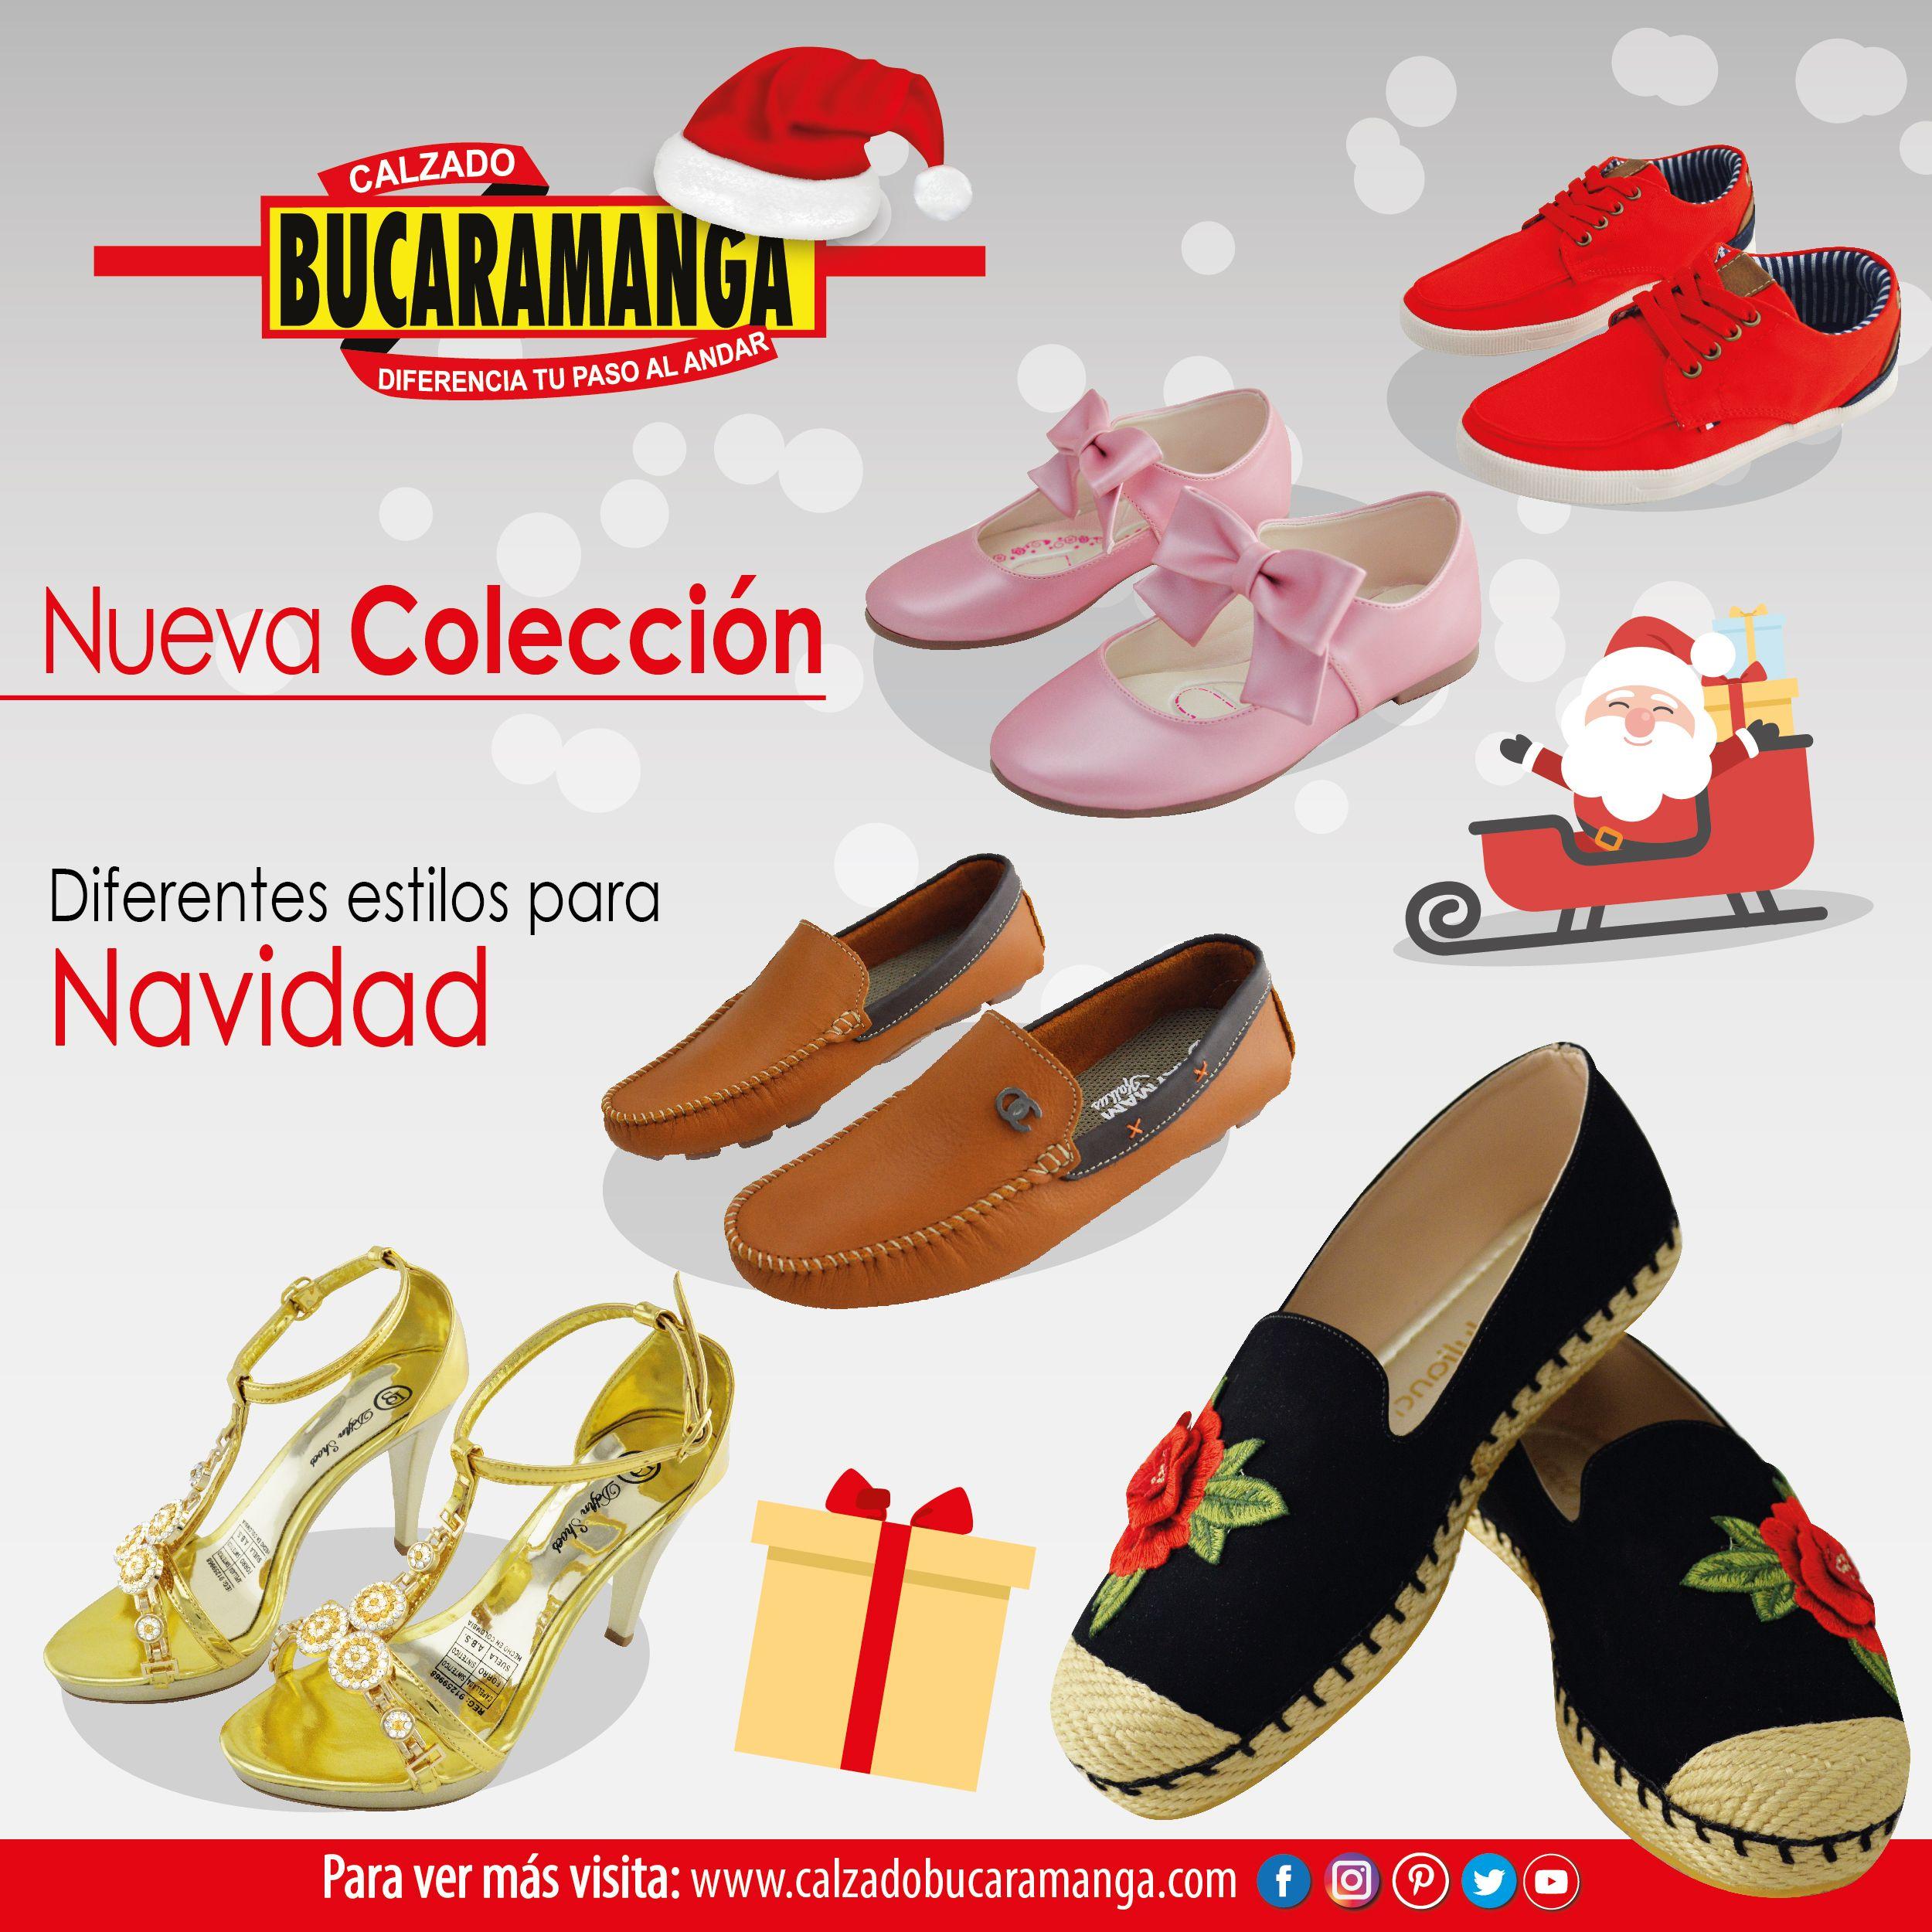 aeeb9934d9 Calzado Bucaramanga presenta su nueva colección para #Navidad. www. calzadobucaramanga.com